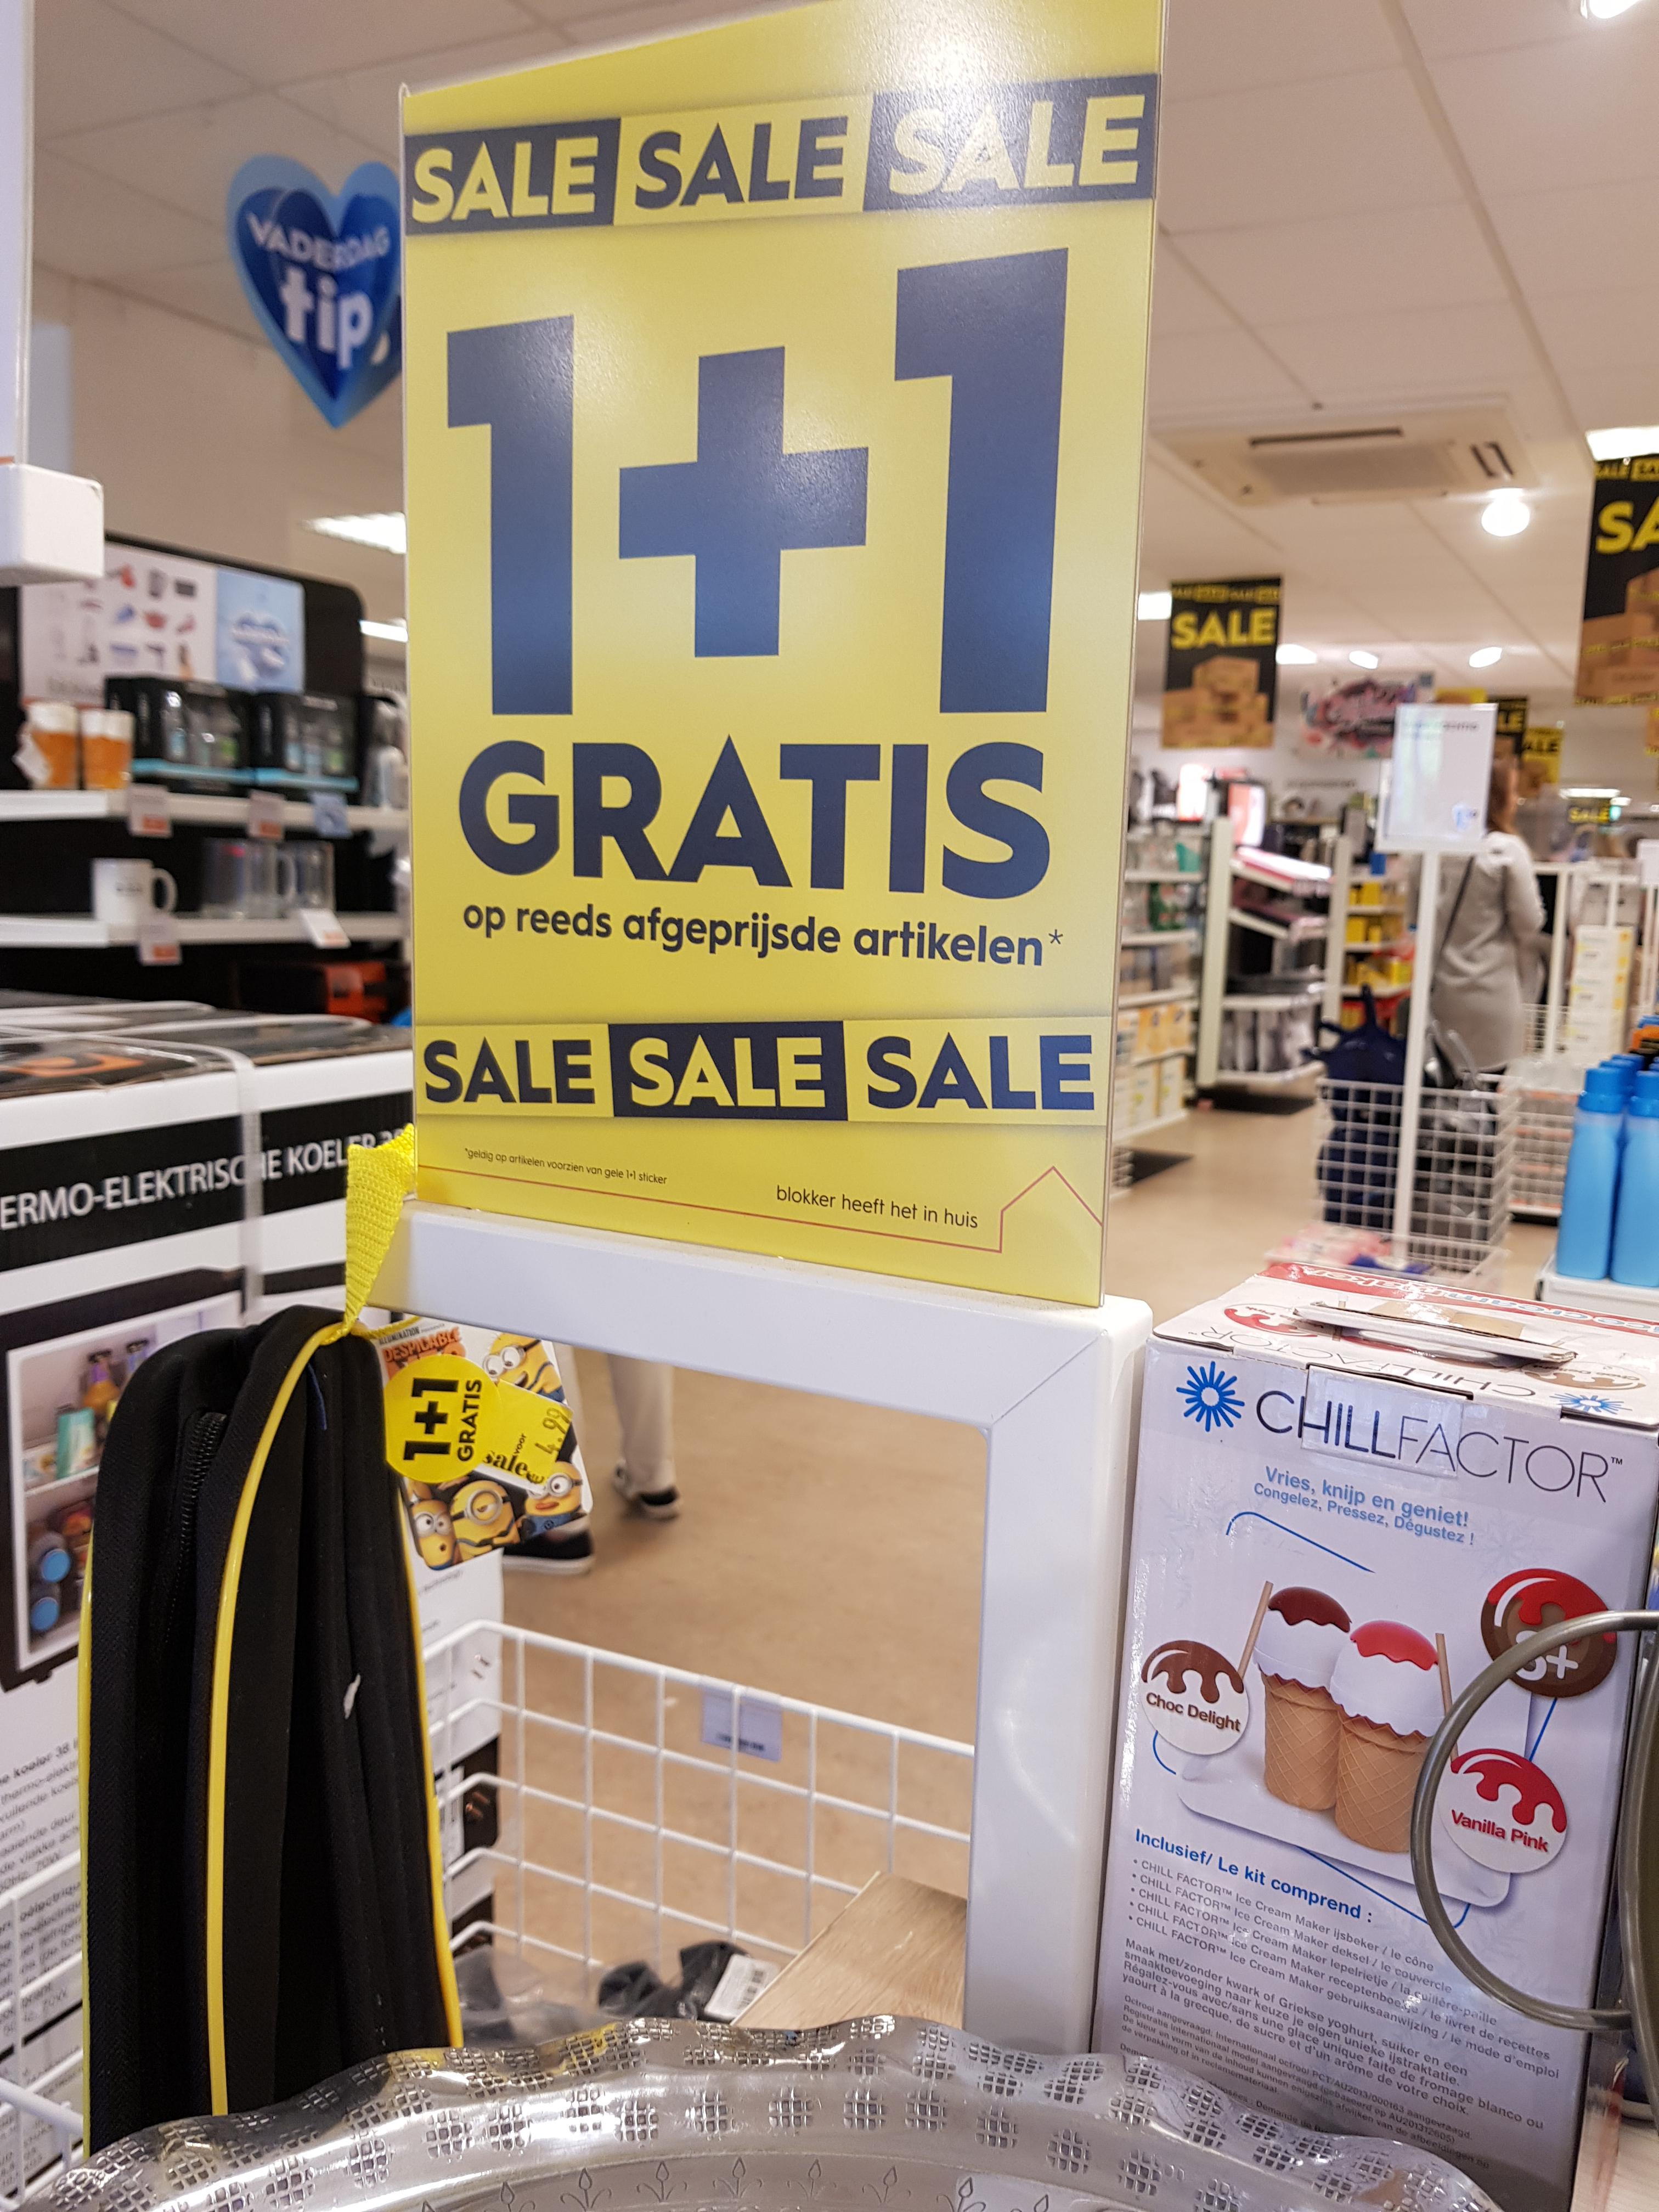 [NU OOK ONLINE] Diverse sale 1+1 GRATIS - in winkels 50% extra kassakorting @ Blokker